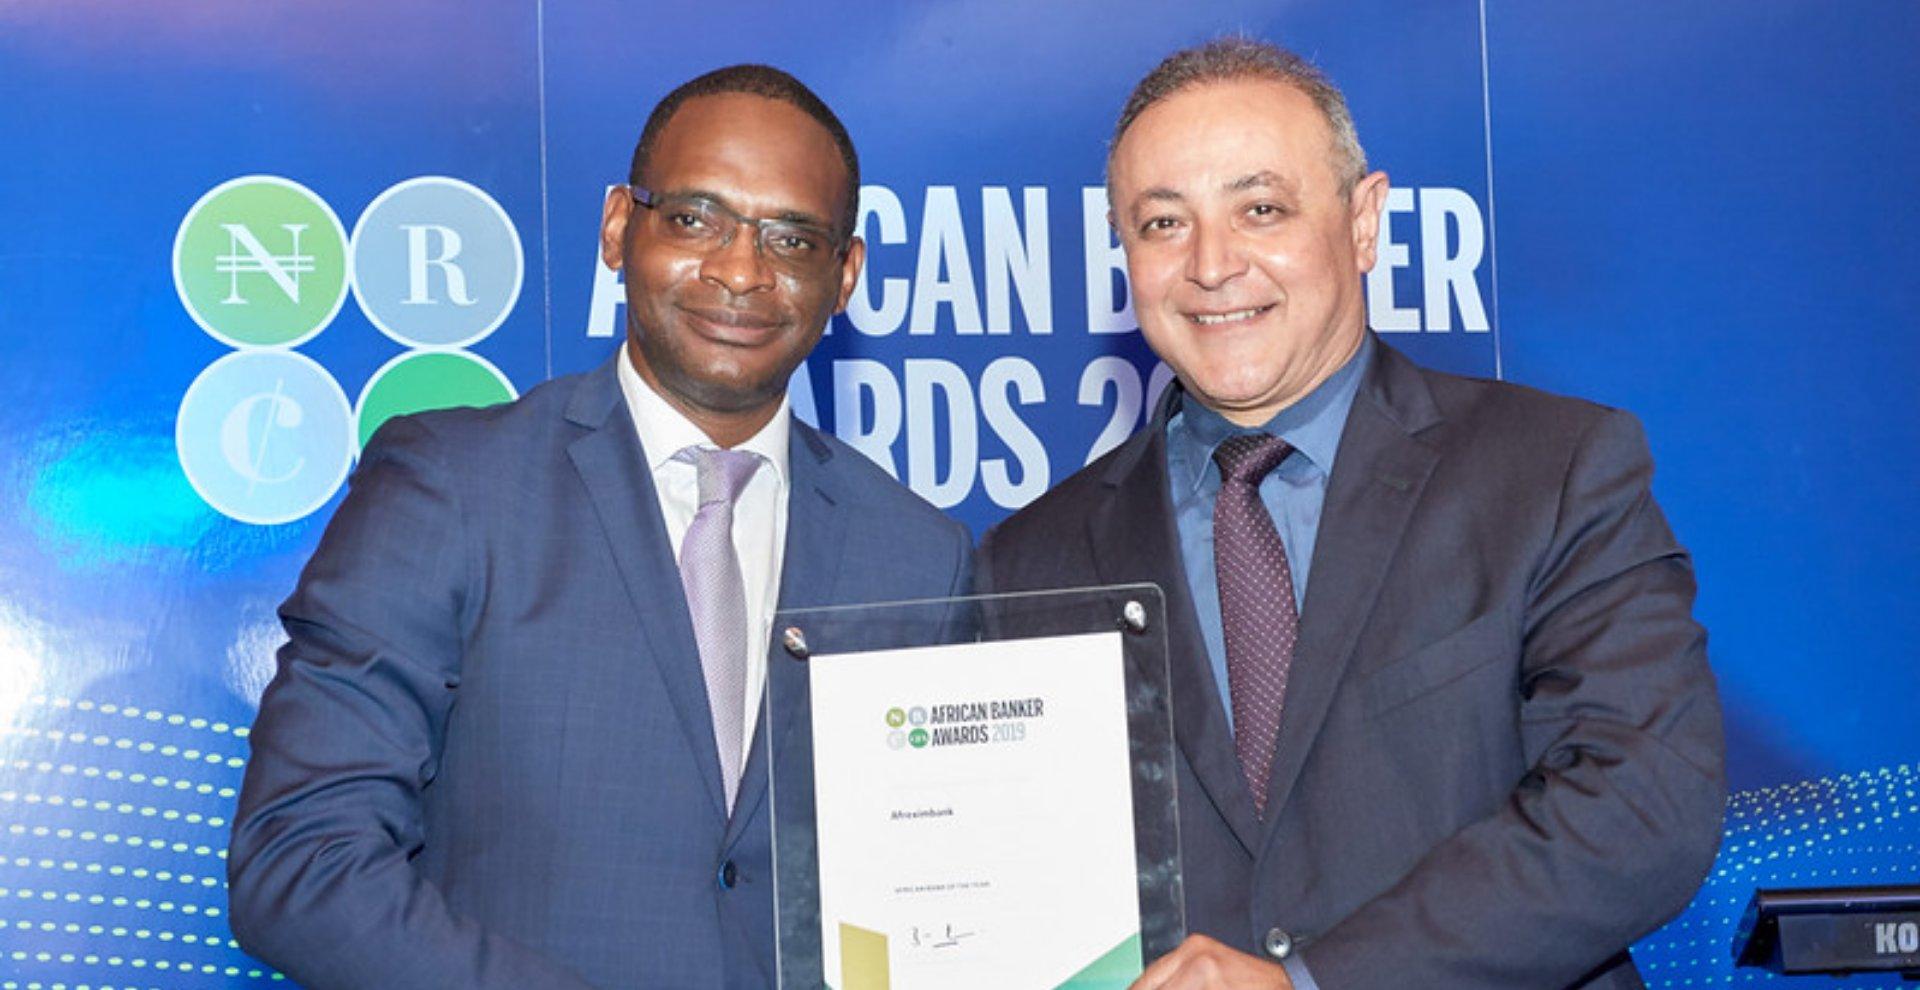 AGF SPONSORS AFRICAN BANKER AWARDS